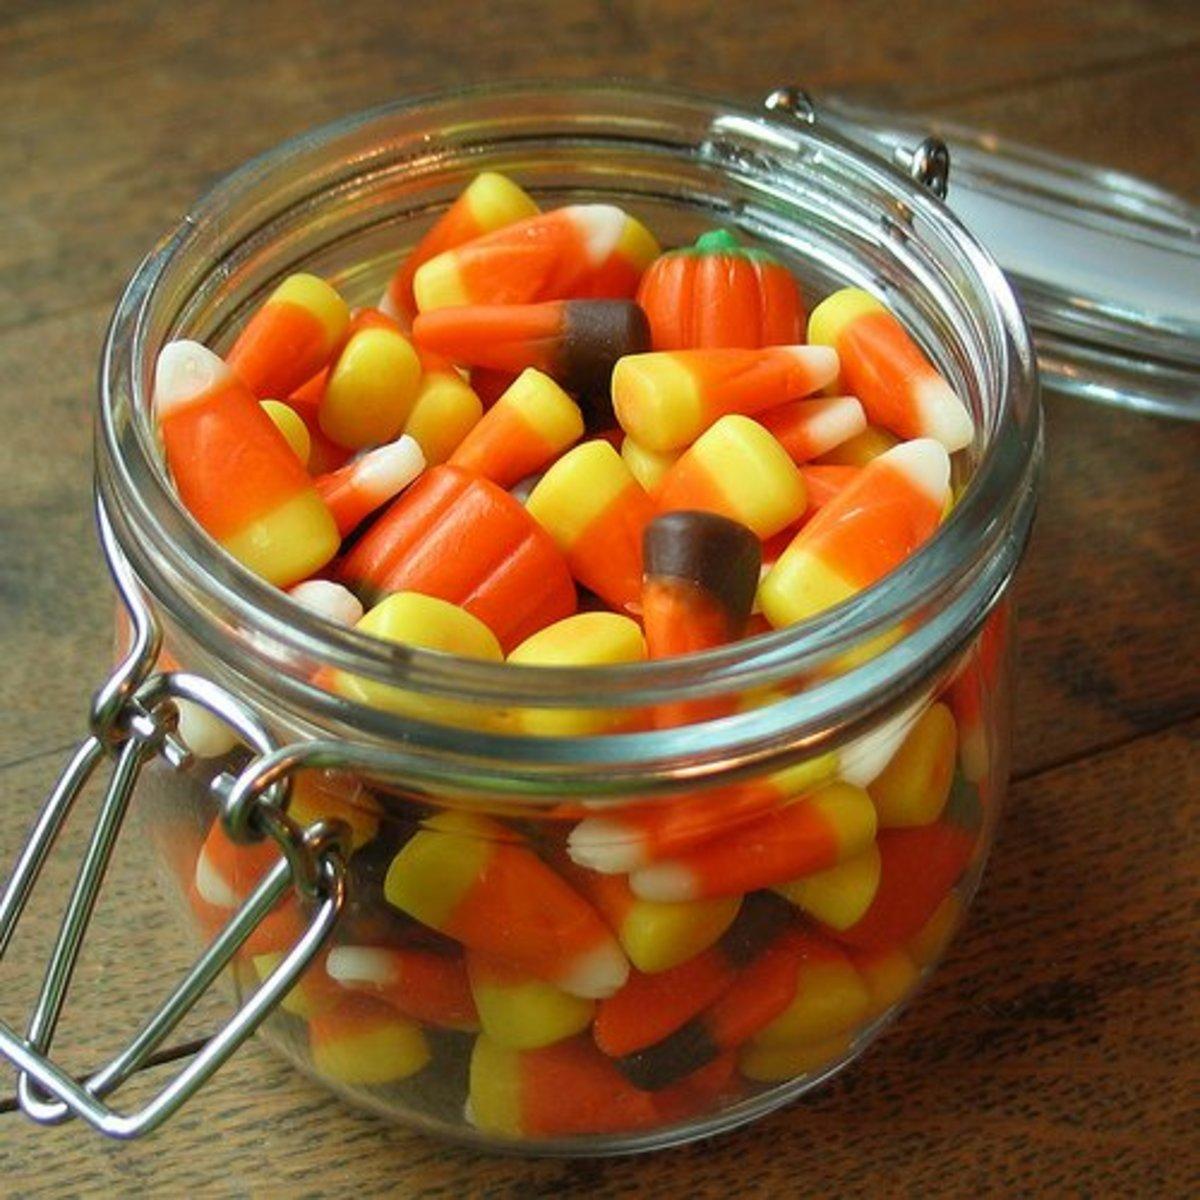 math worksheet : halloween math for kids free candy corn activities worksheets  : Candy Corn Math Worksheets